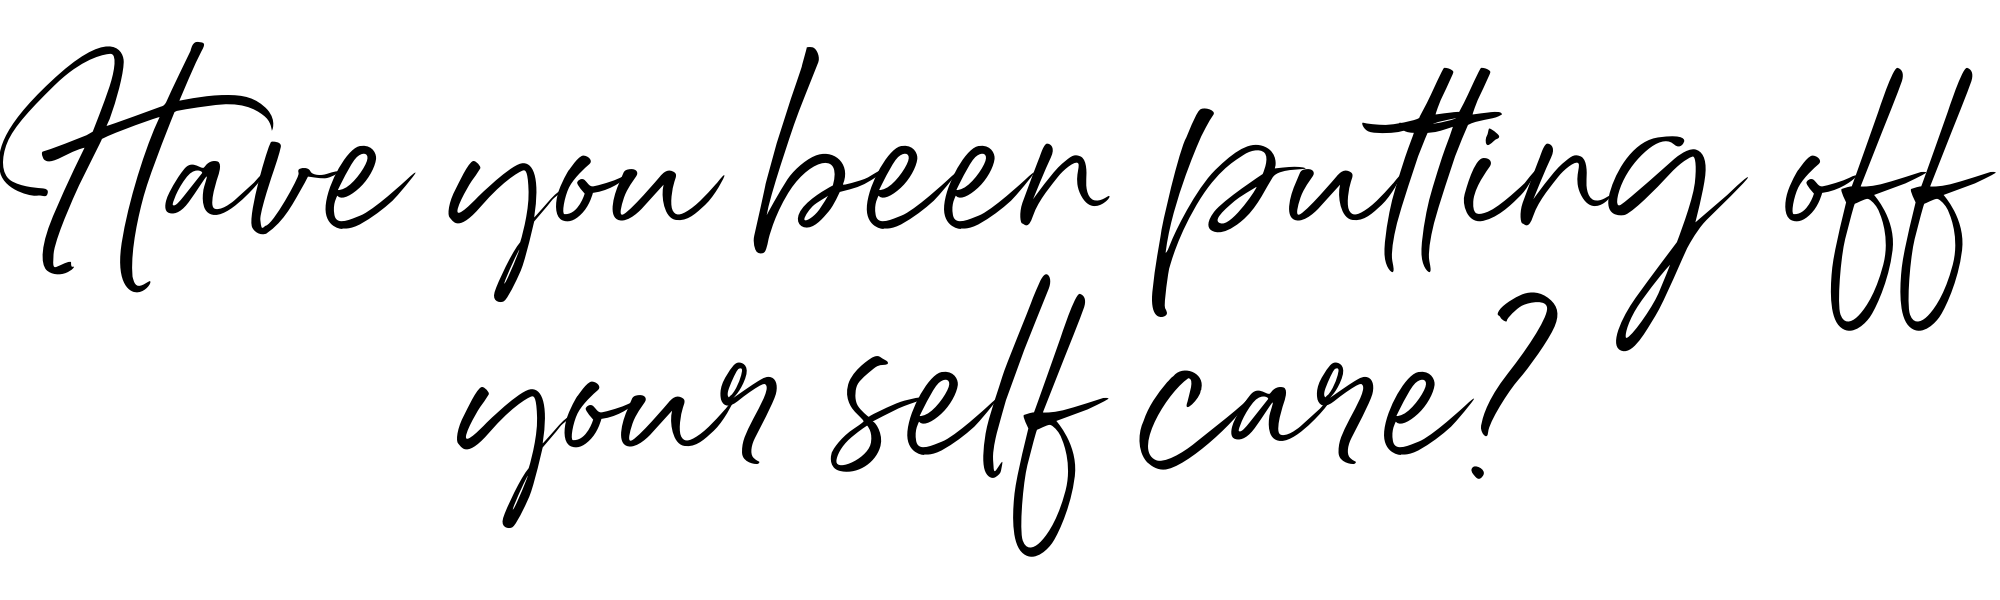 Copy of Rose Quartz - white (21)